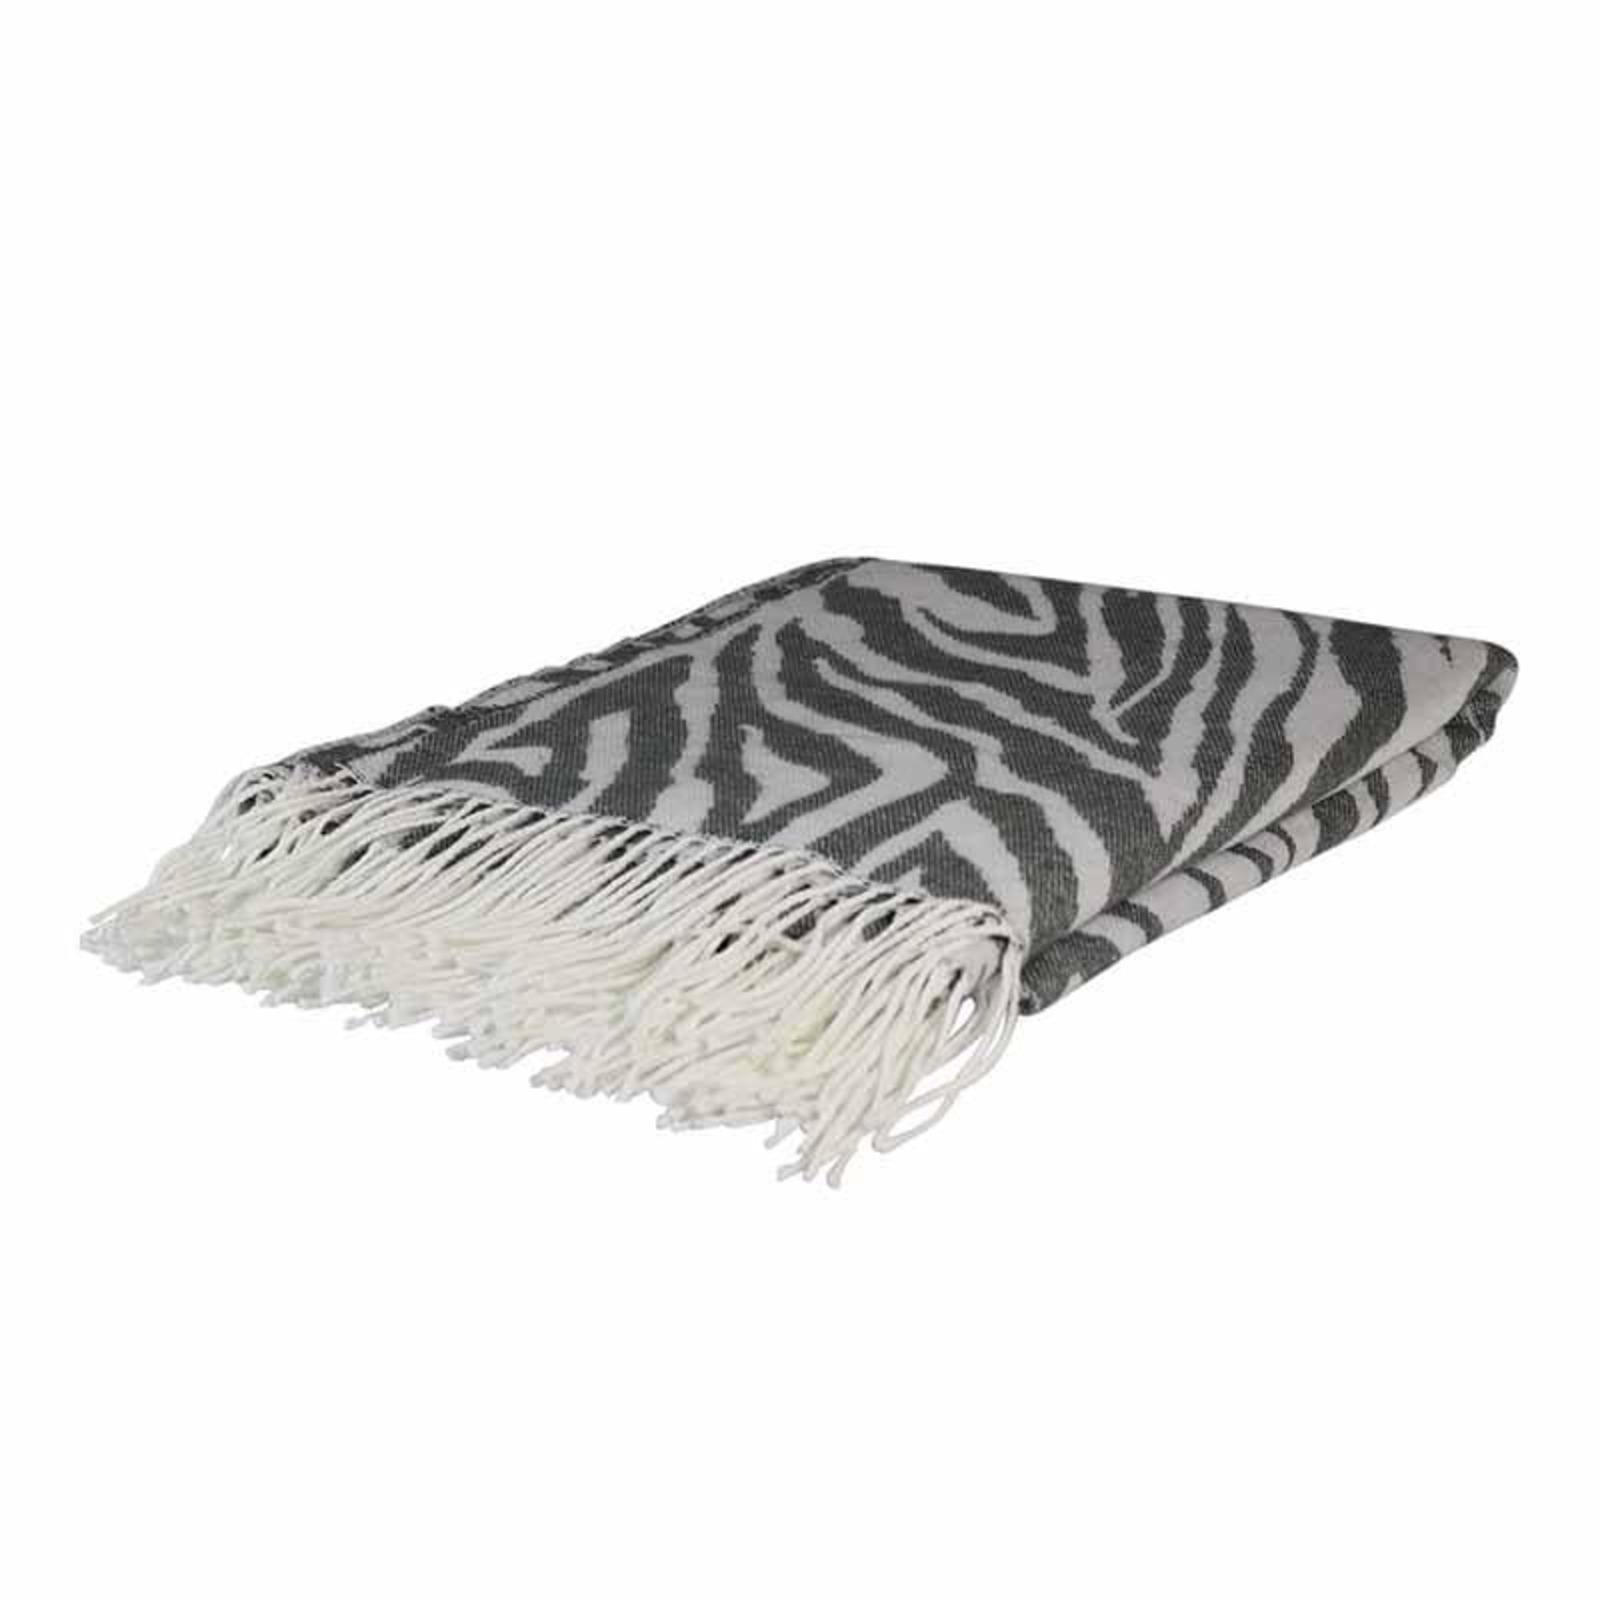 Zebra Charcoal Jacquard Throw